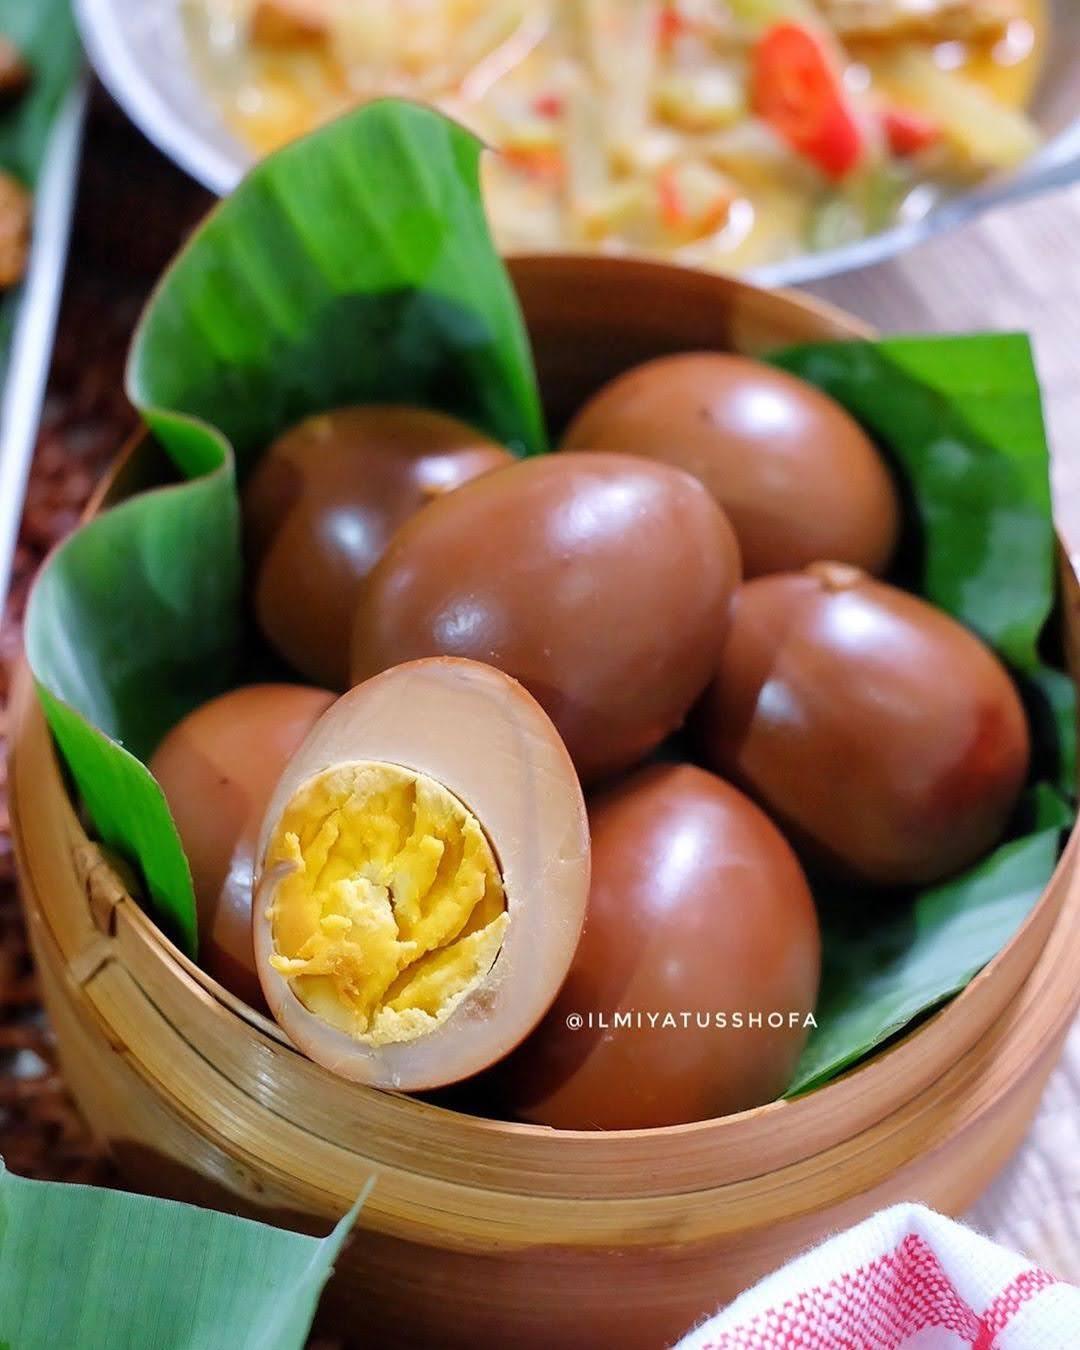 Resep Telur Bacem : resep, telur, bacem, RESEP, TELUR, BACEM, Resep, Masakan, Nusantara